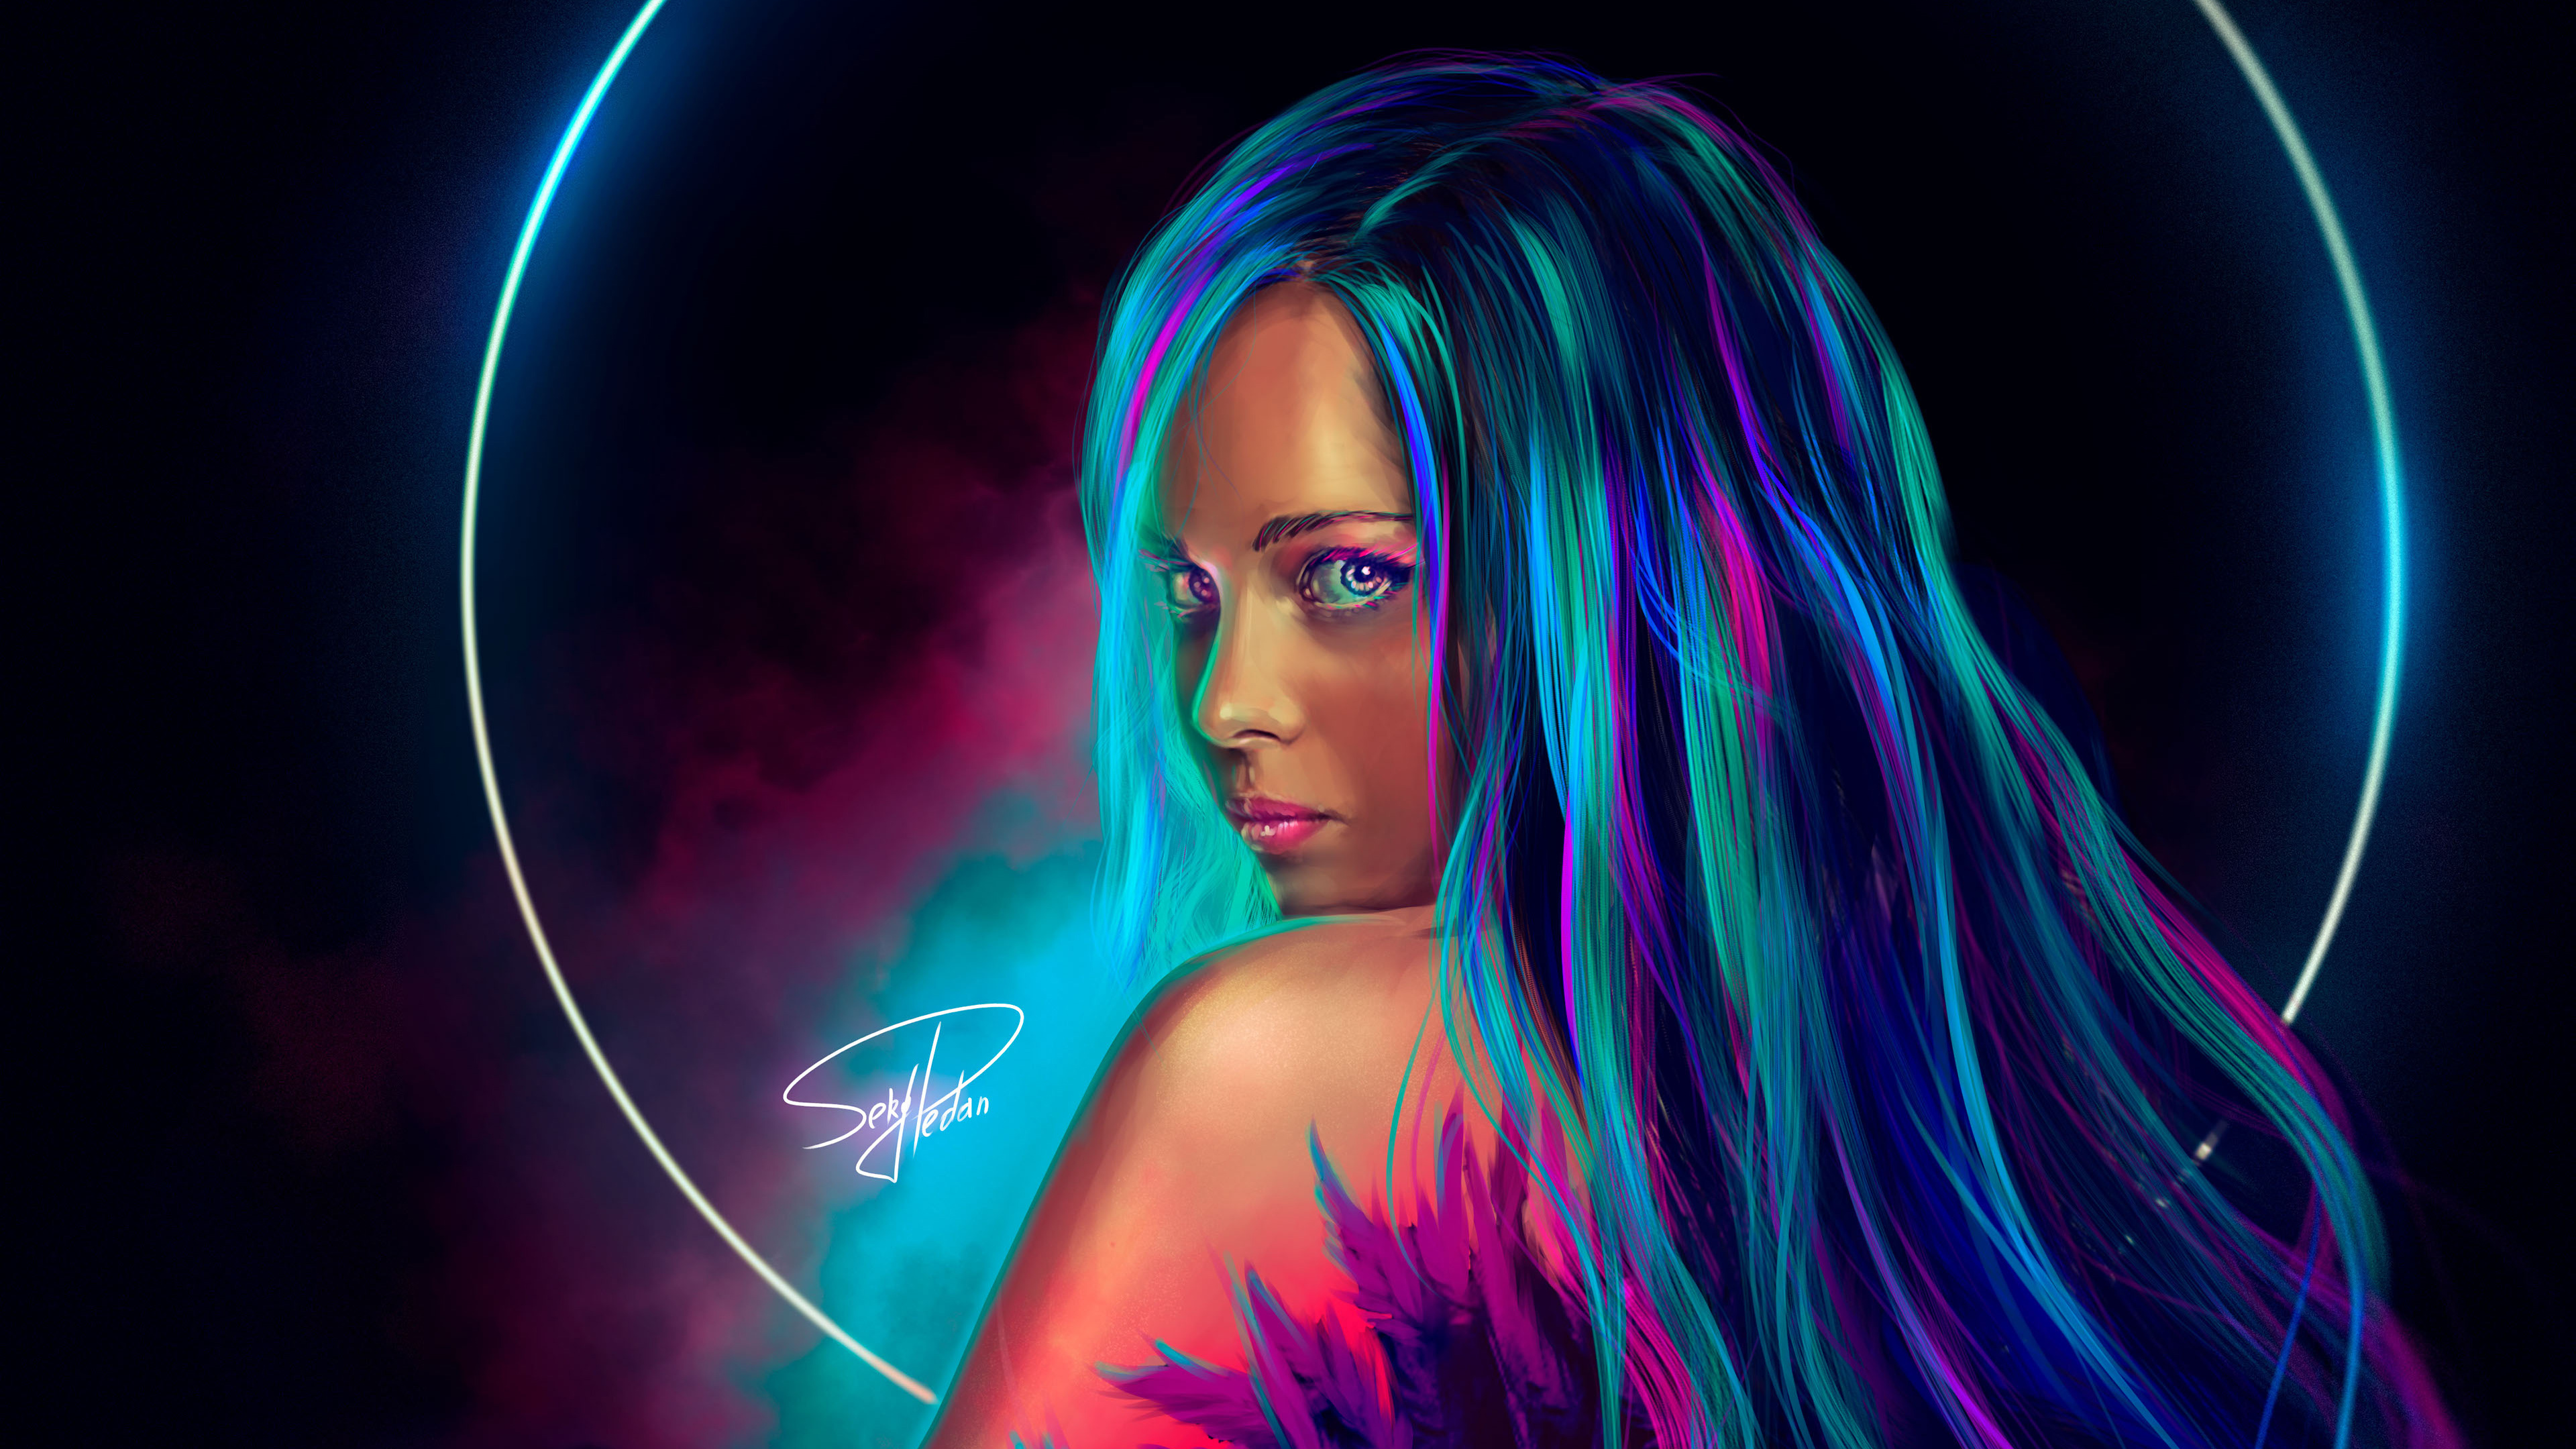 Neon Girl Digital Art Hd Artist 4k Wallpapers Images